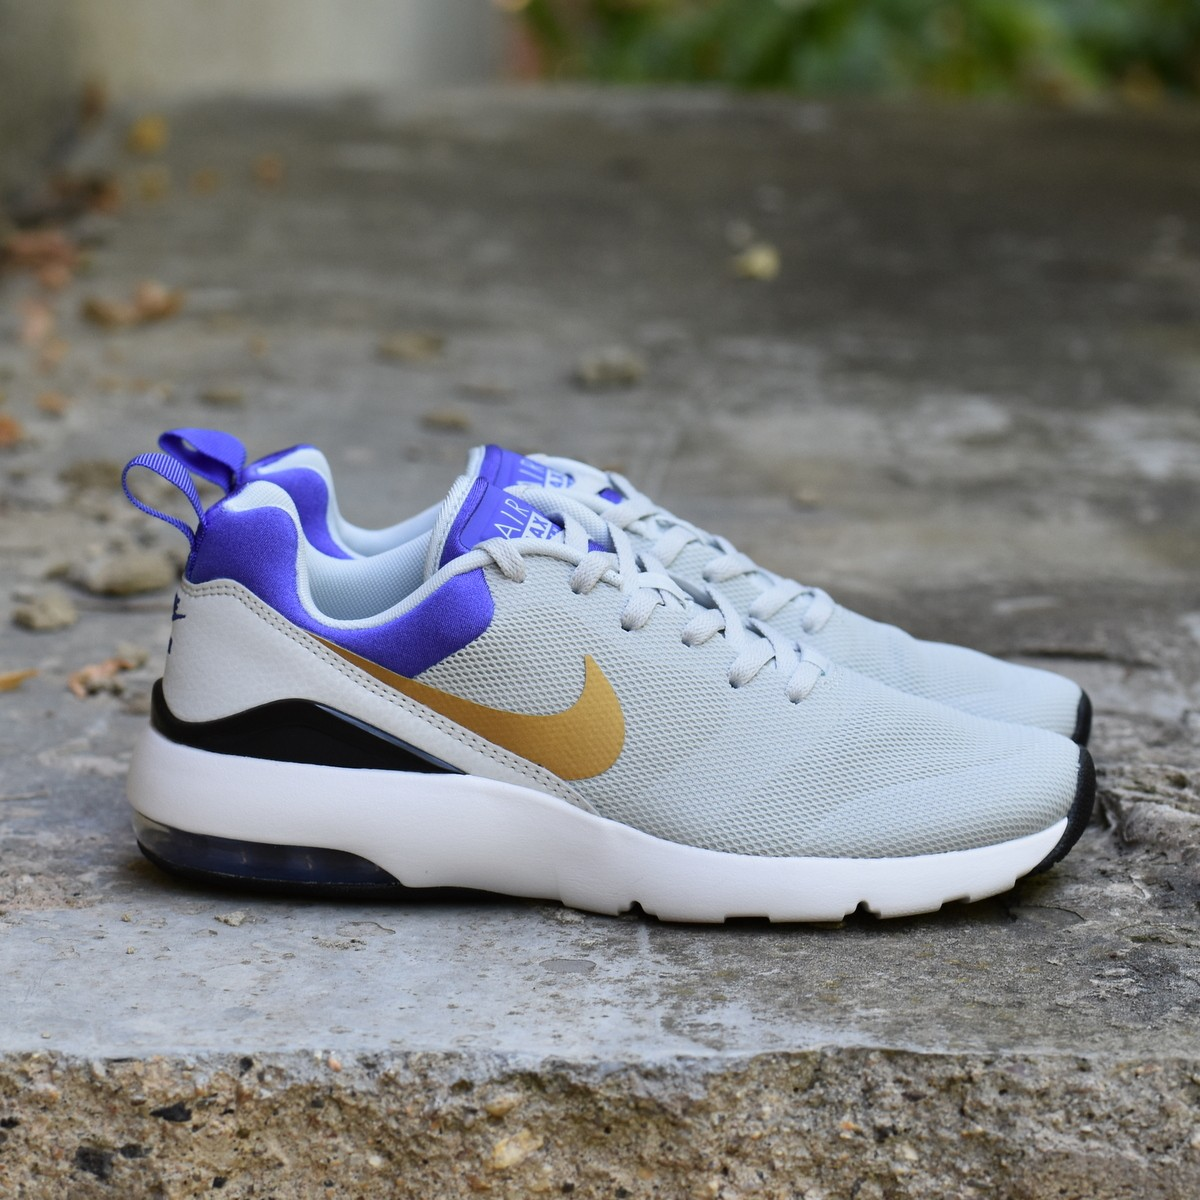 Nike WMNS AIR MAX SIREN Dámské boty EU 36.5 749510-001